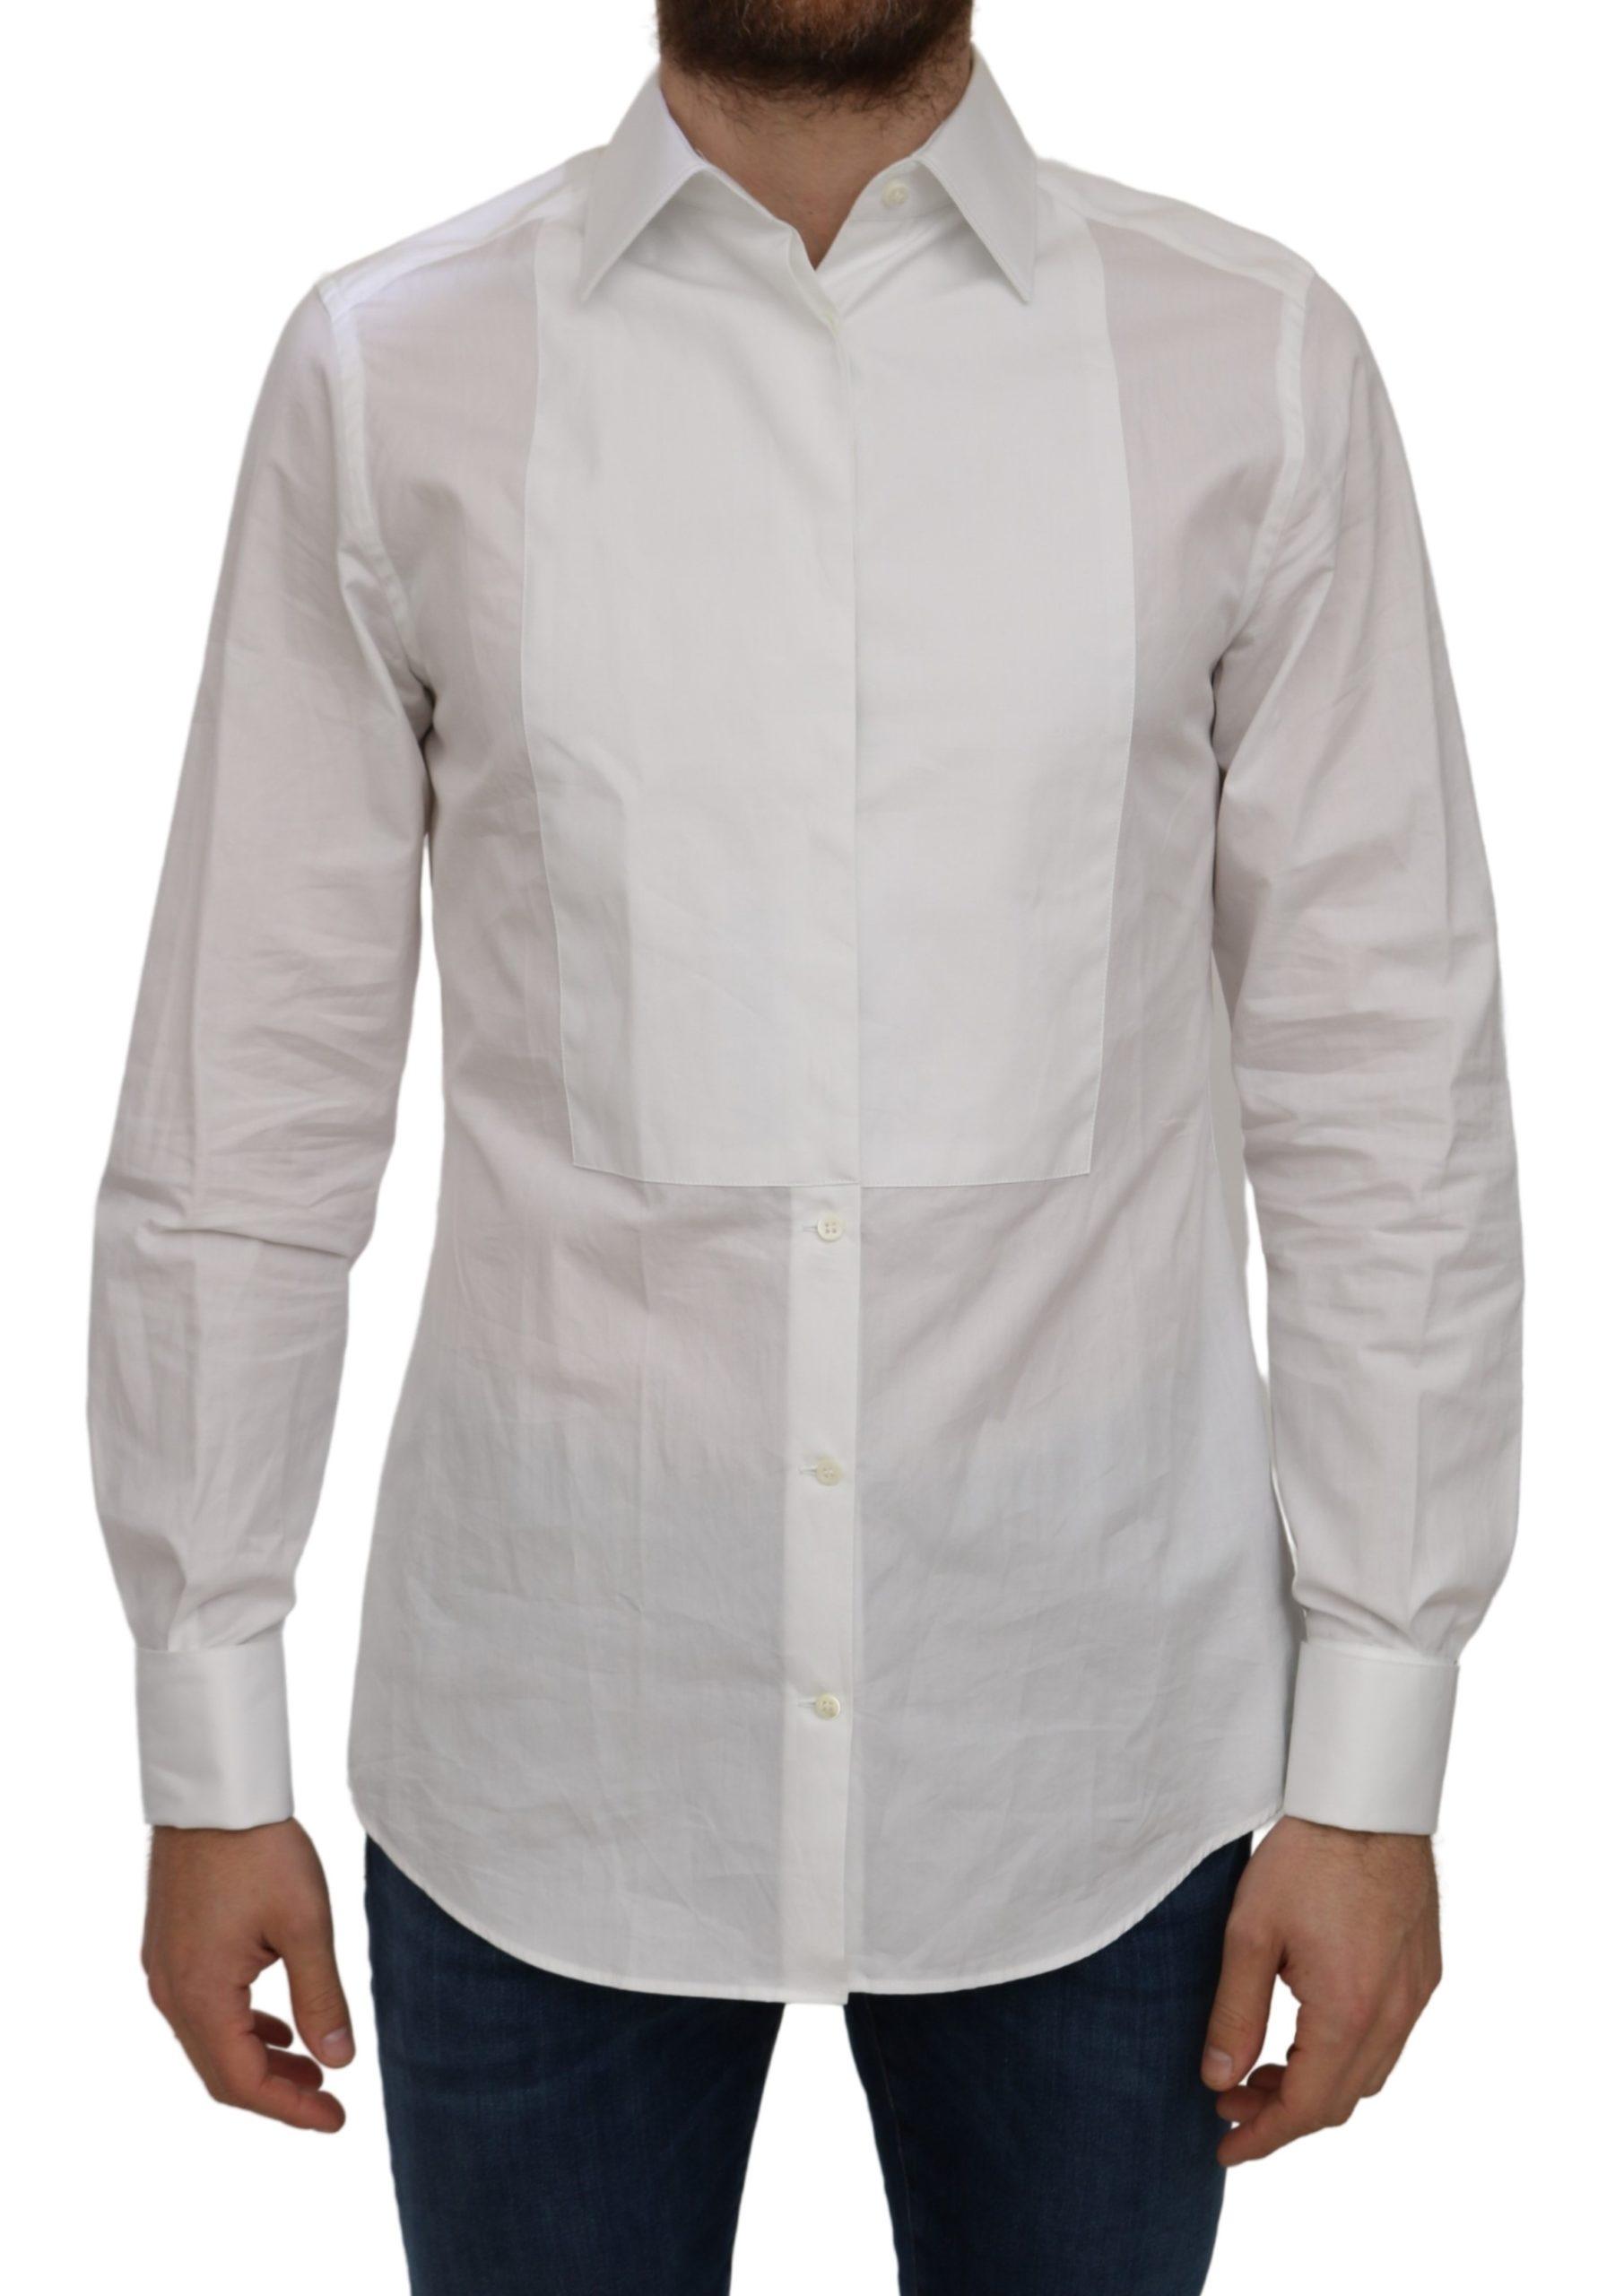 Dolce & Gabbana Men's Cotton Solid Shirt White TSH5028 - IT42 | XL